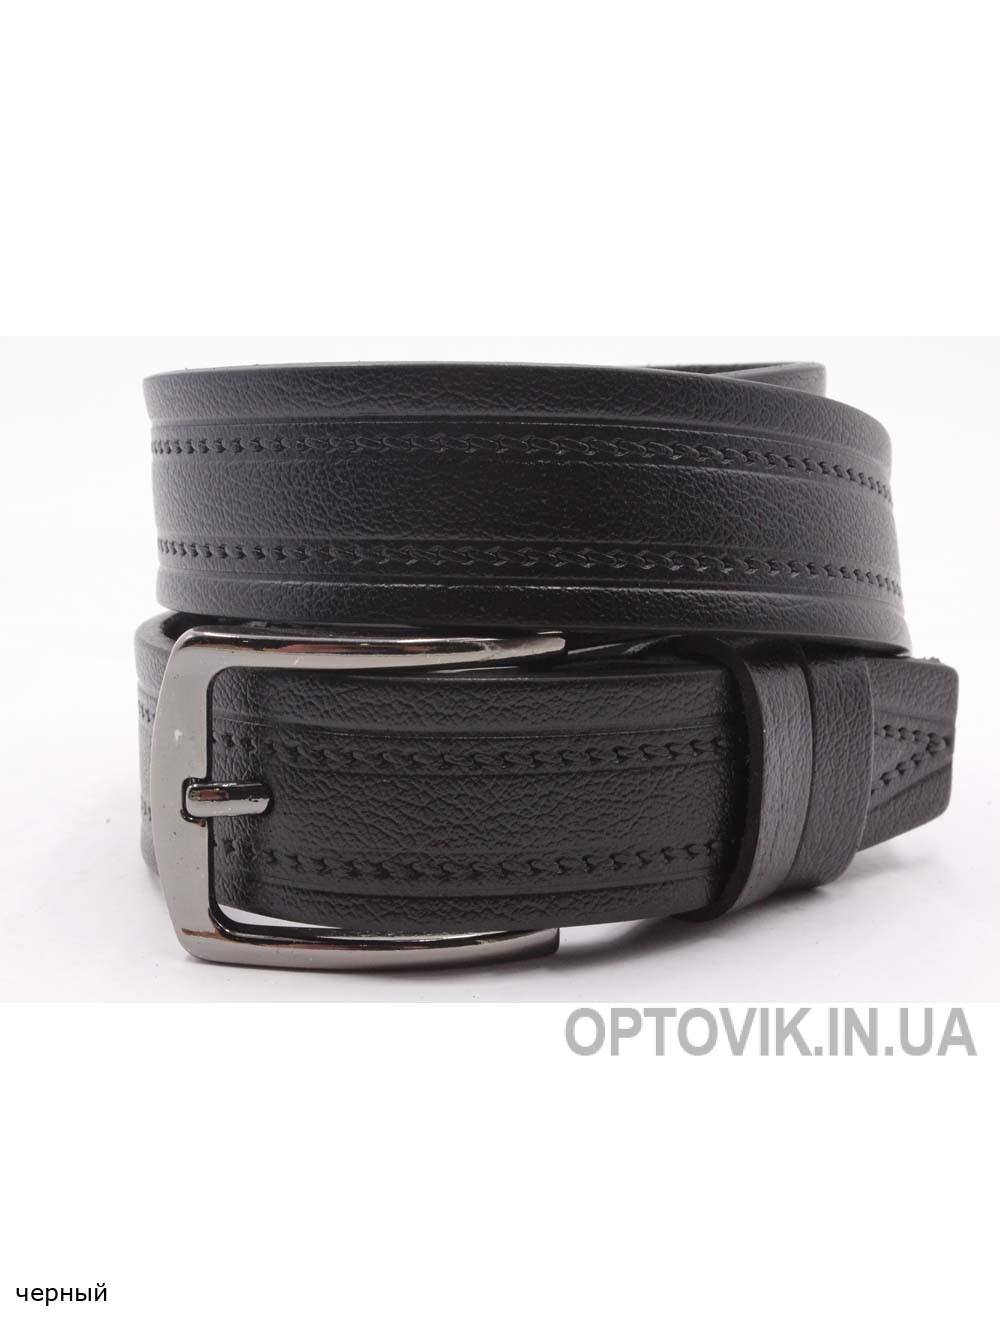 Ремень кожа 35 Real Leather - 1rl116057